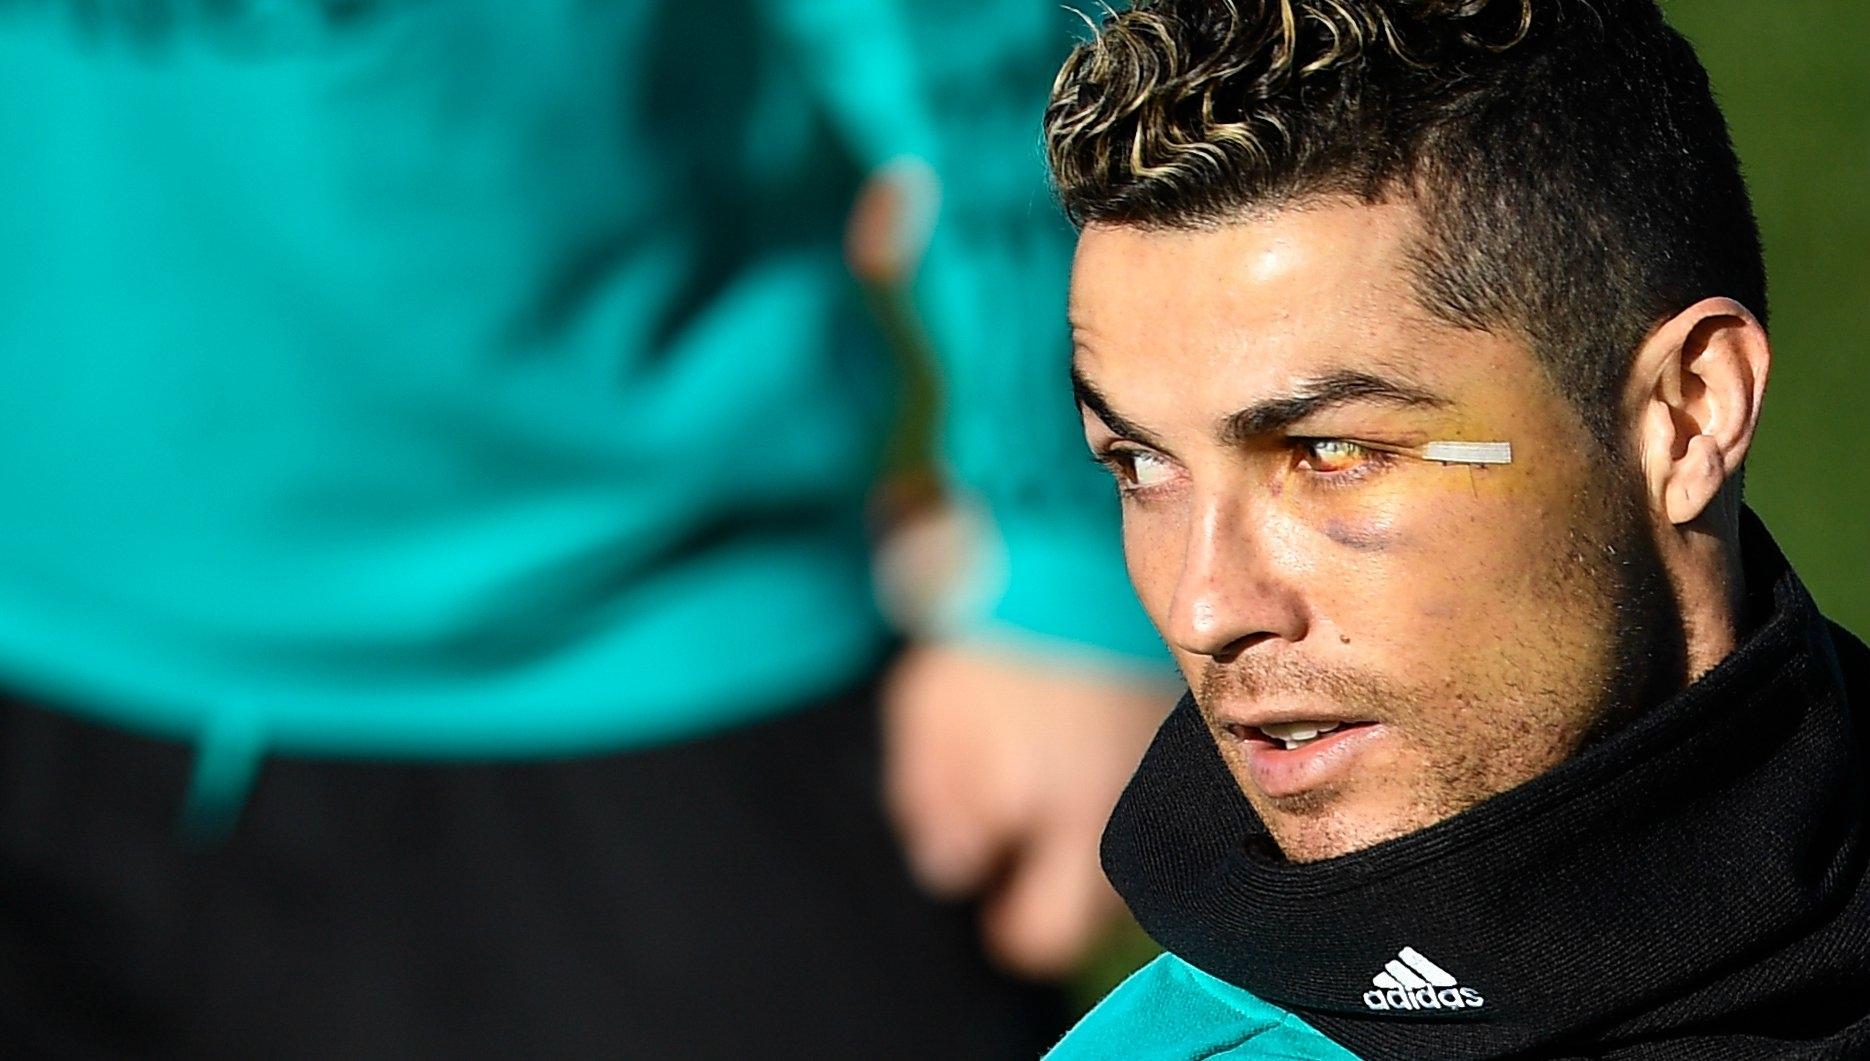 Cristiano Ronaldo Haircut 2002 Topsimages